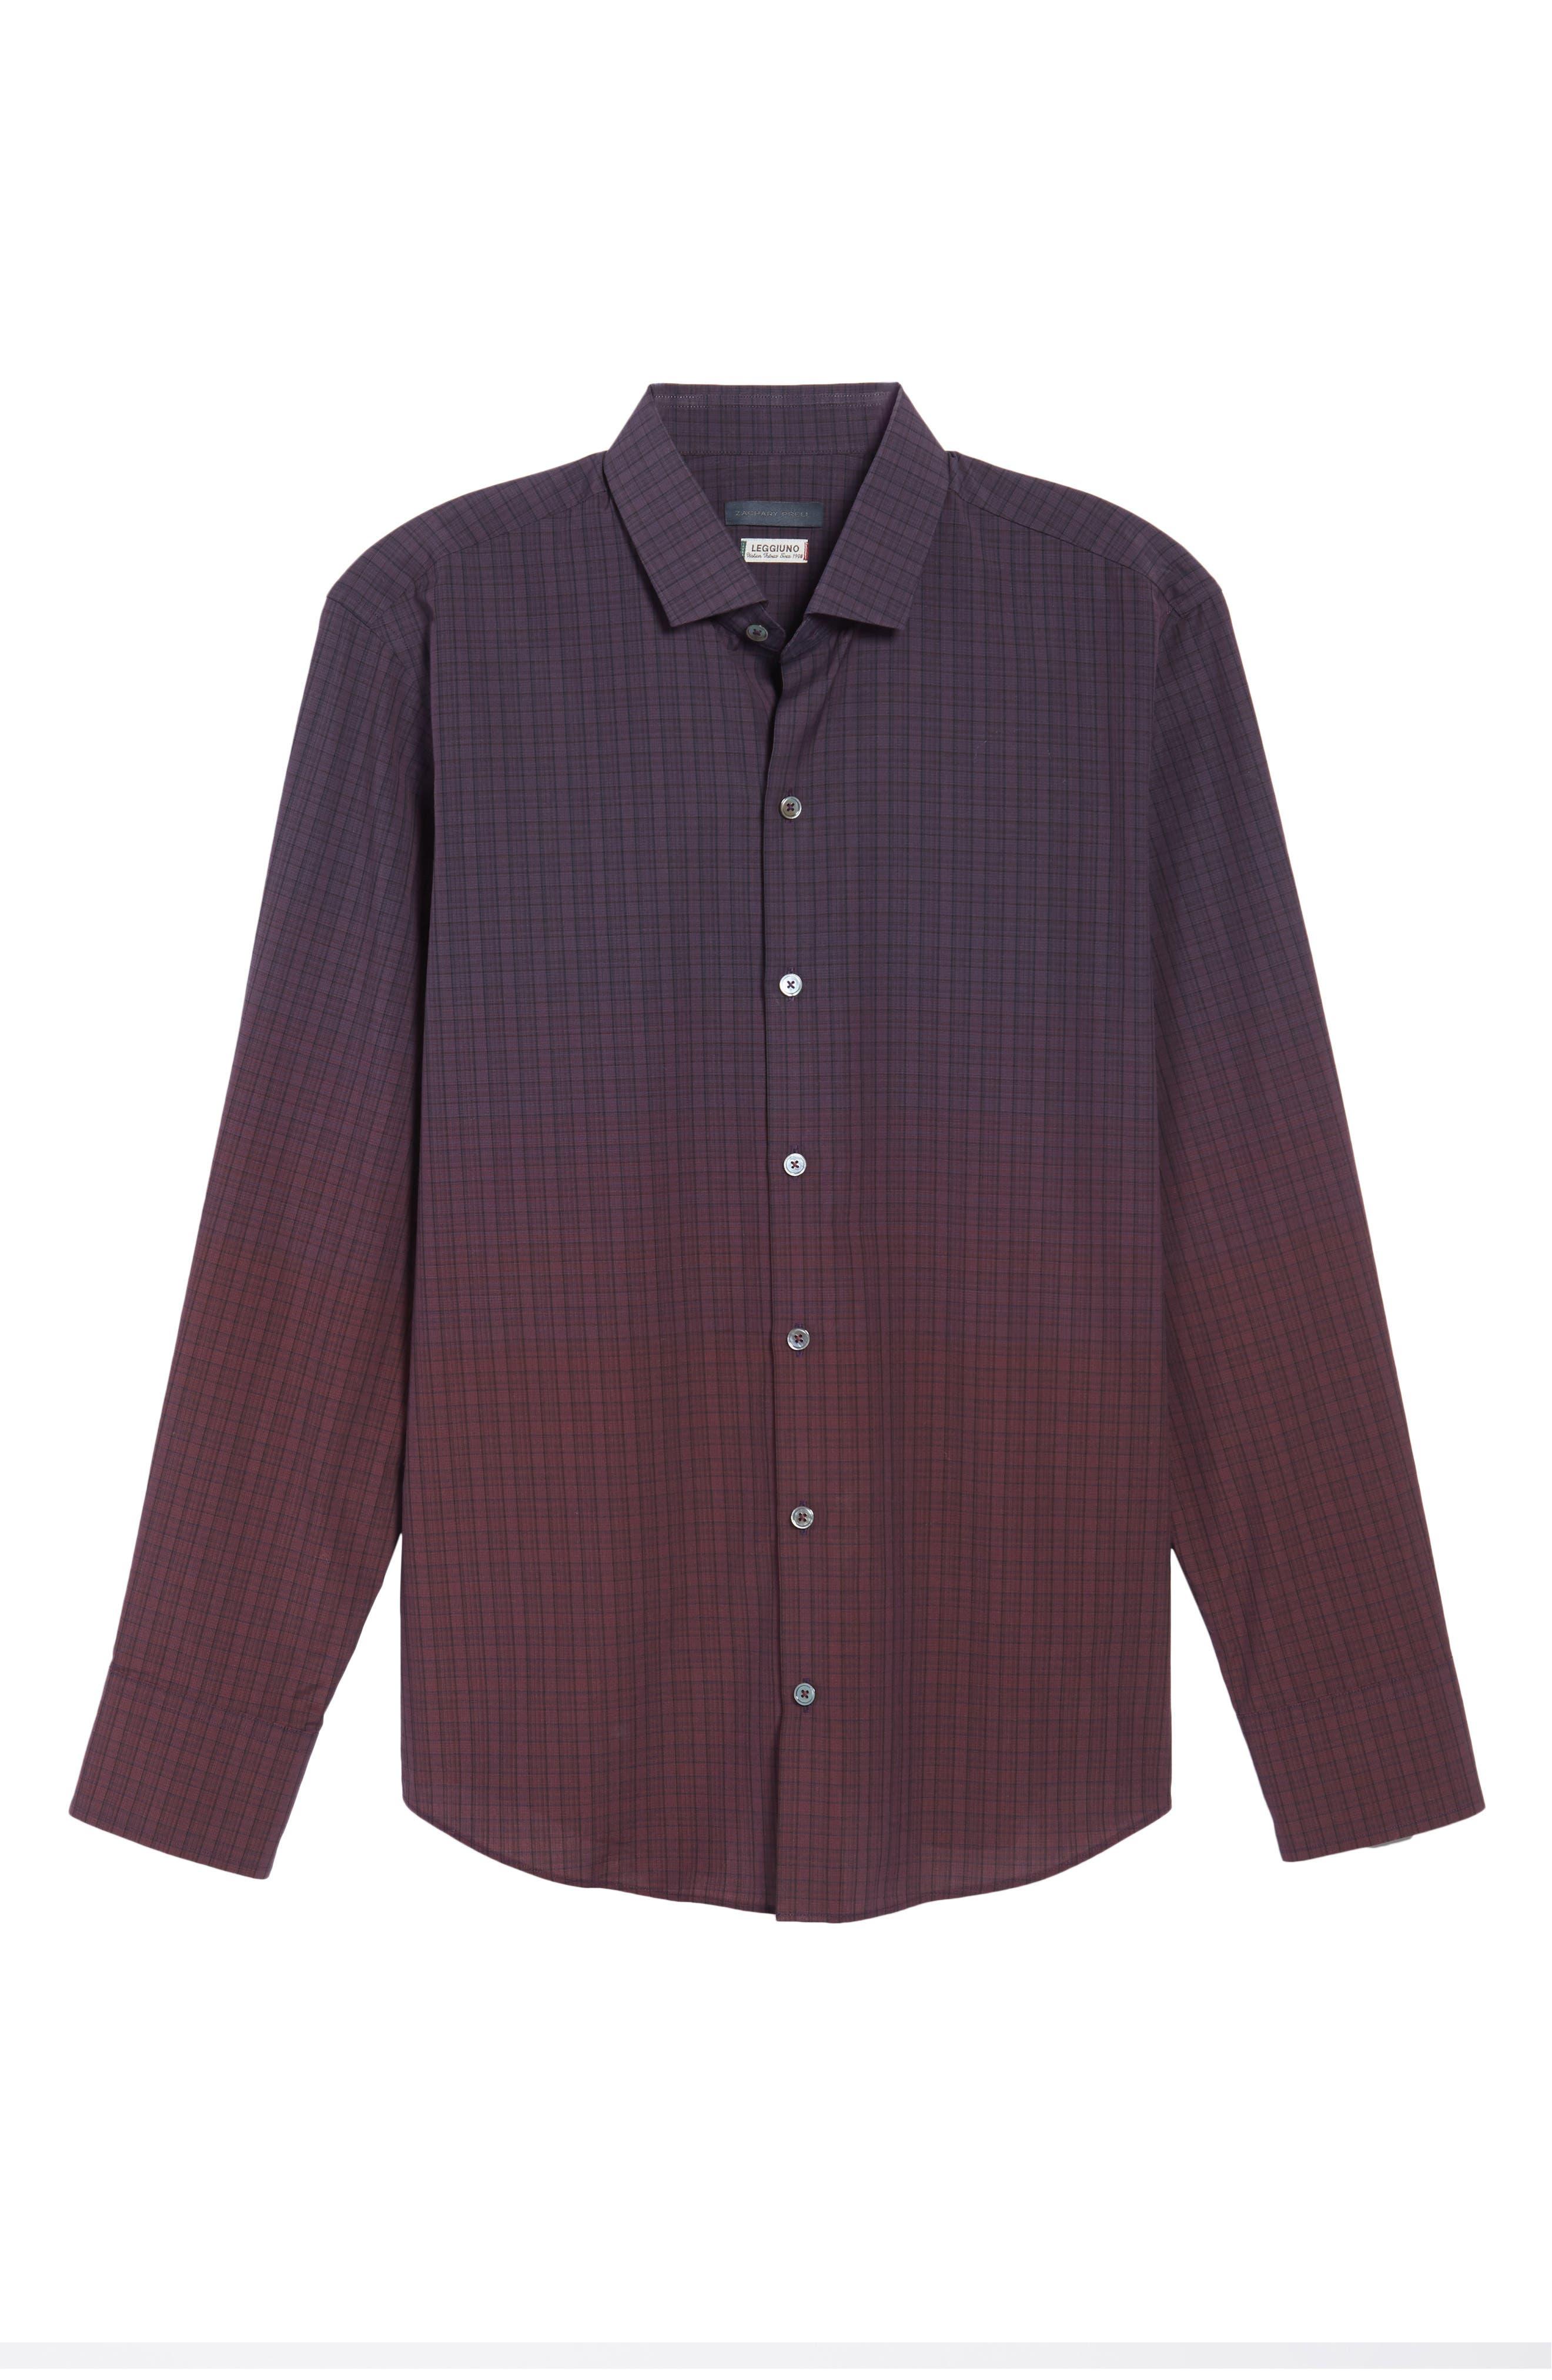 Wein Slim Fit Check Sport Shirt,                             Alternate thumbnail 12, color,